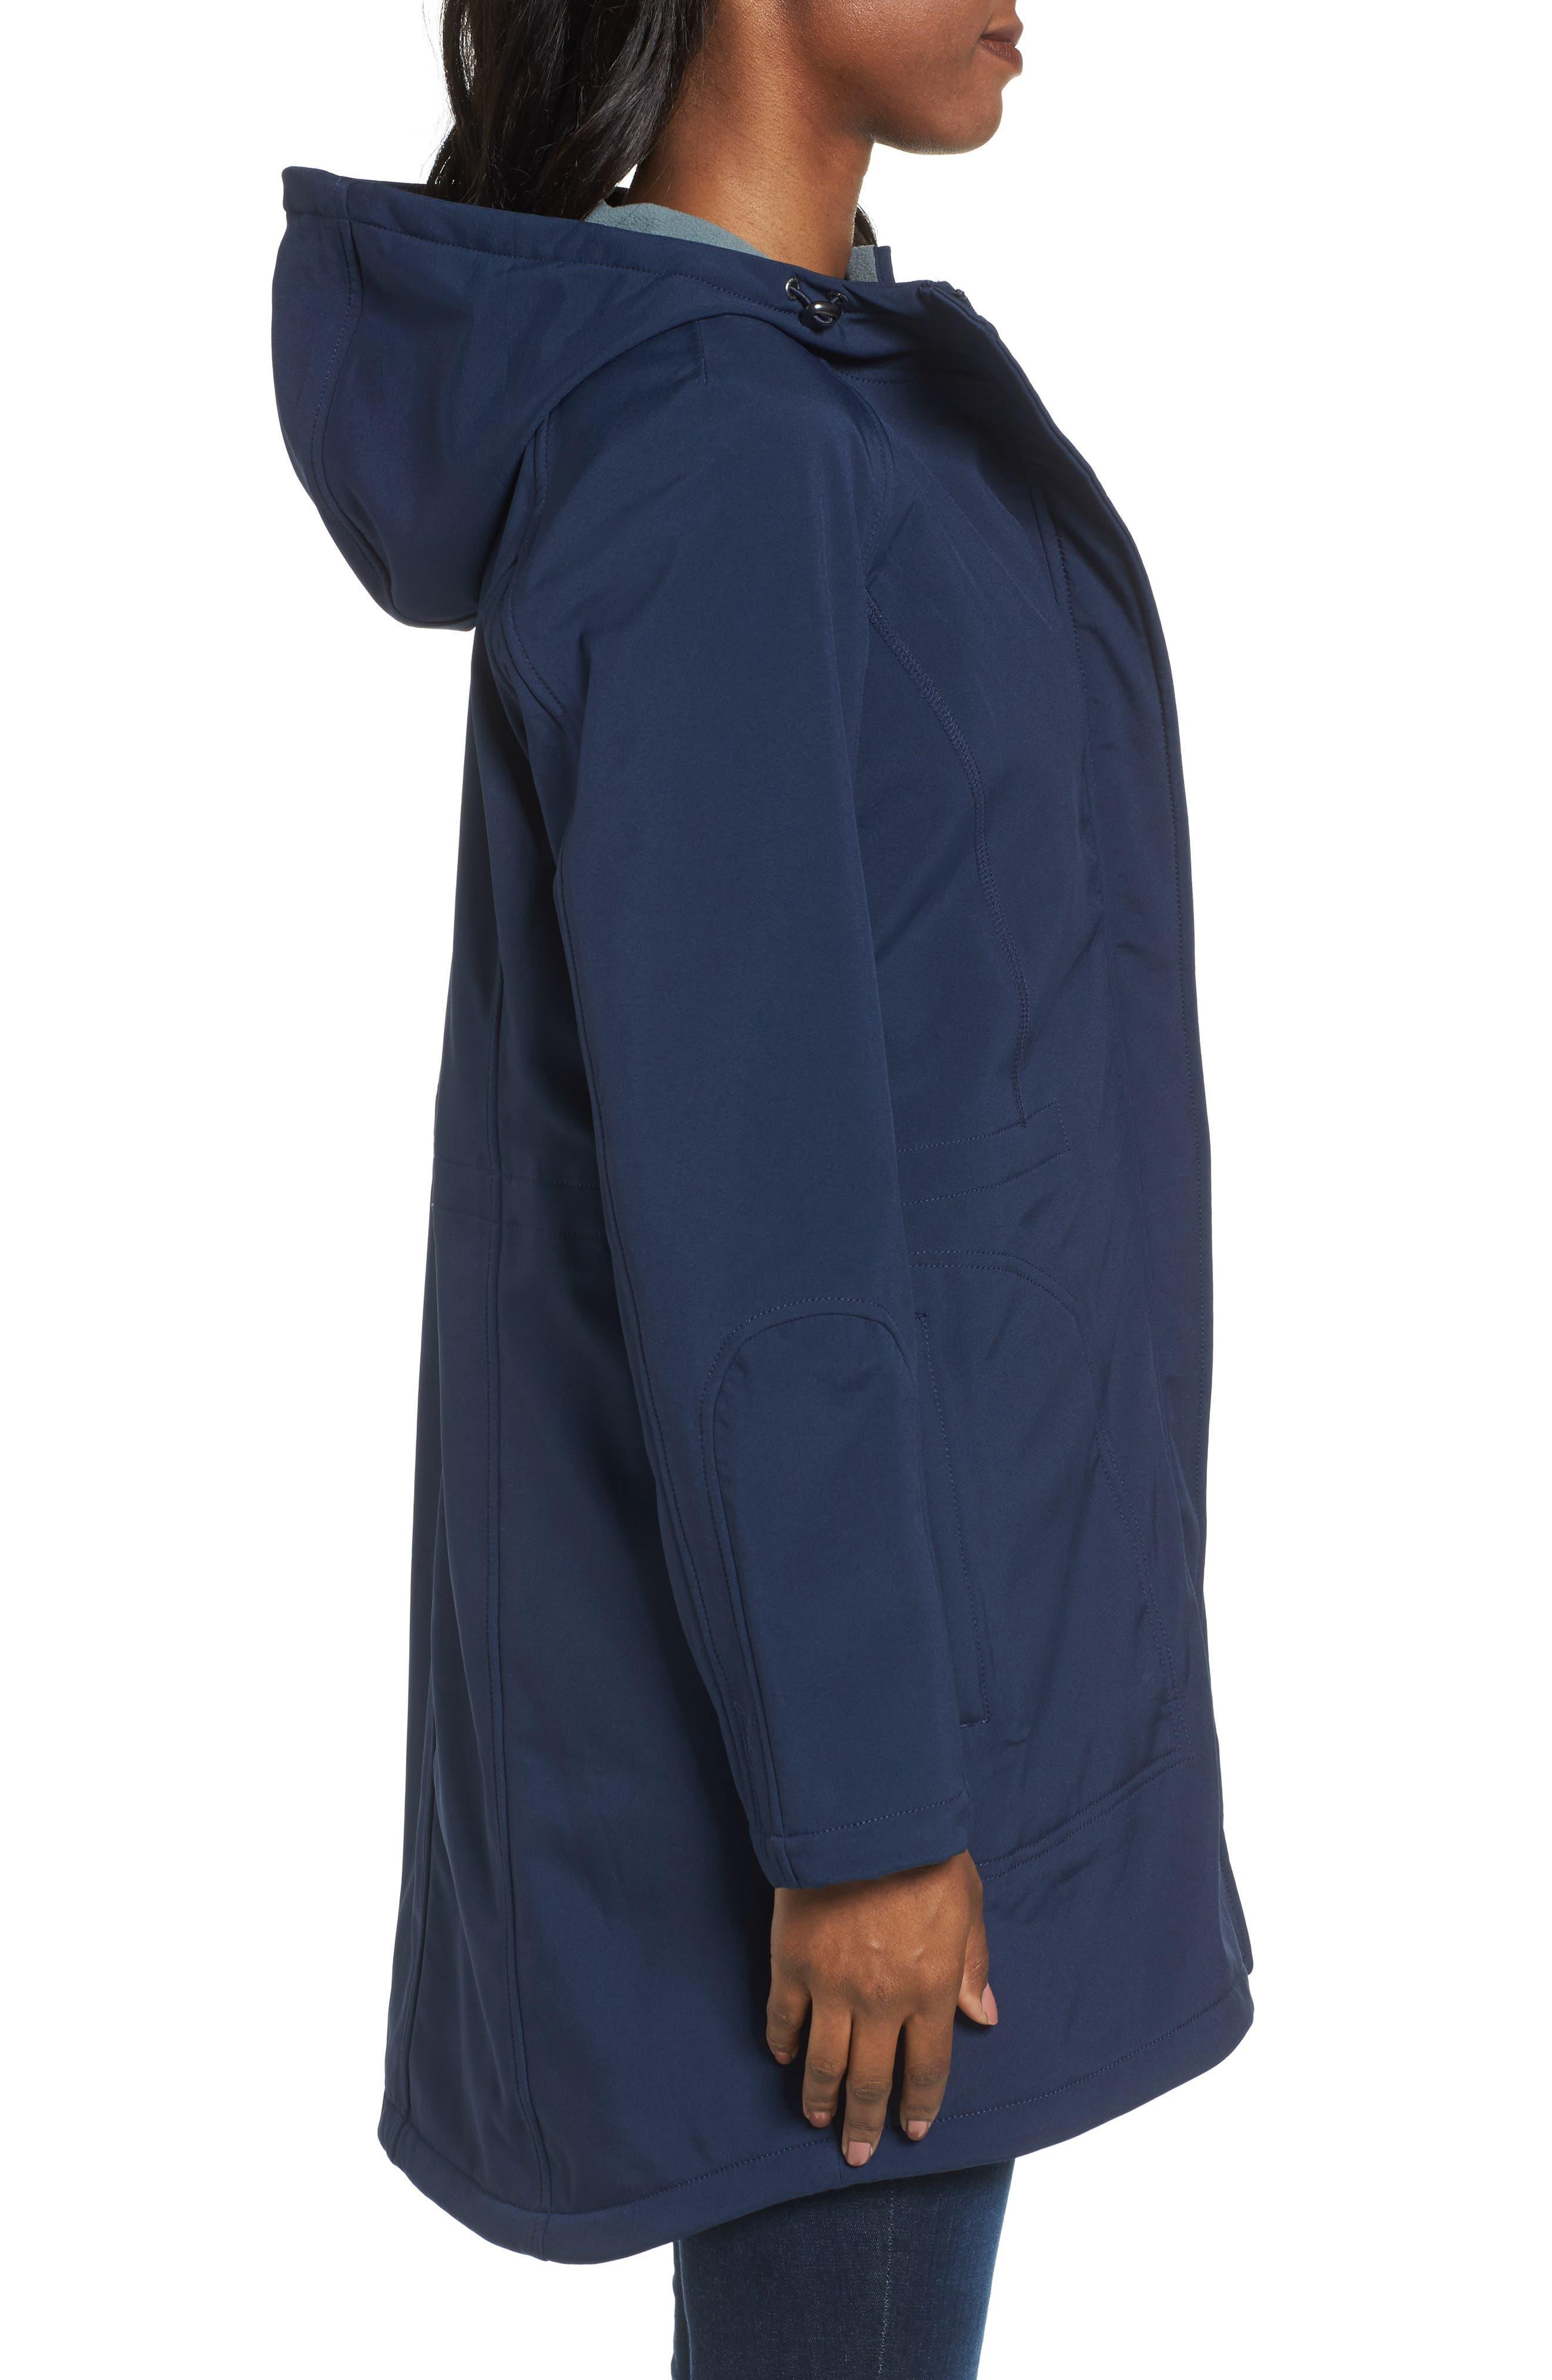 Right as Rain Fleece Lined Raincoat,                             Alternate thumbnail 8, color,